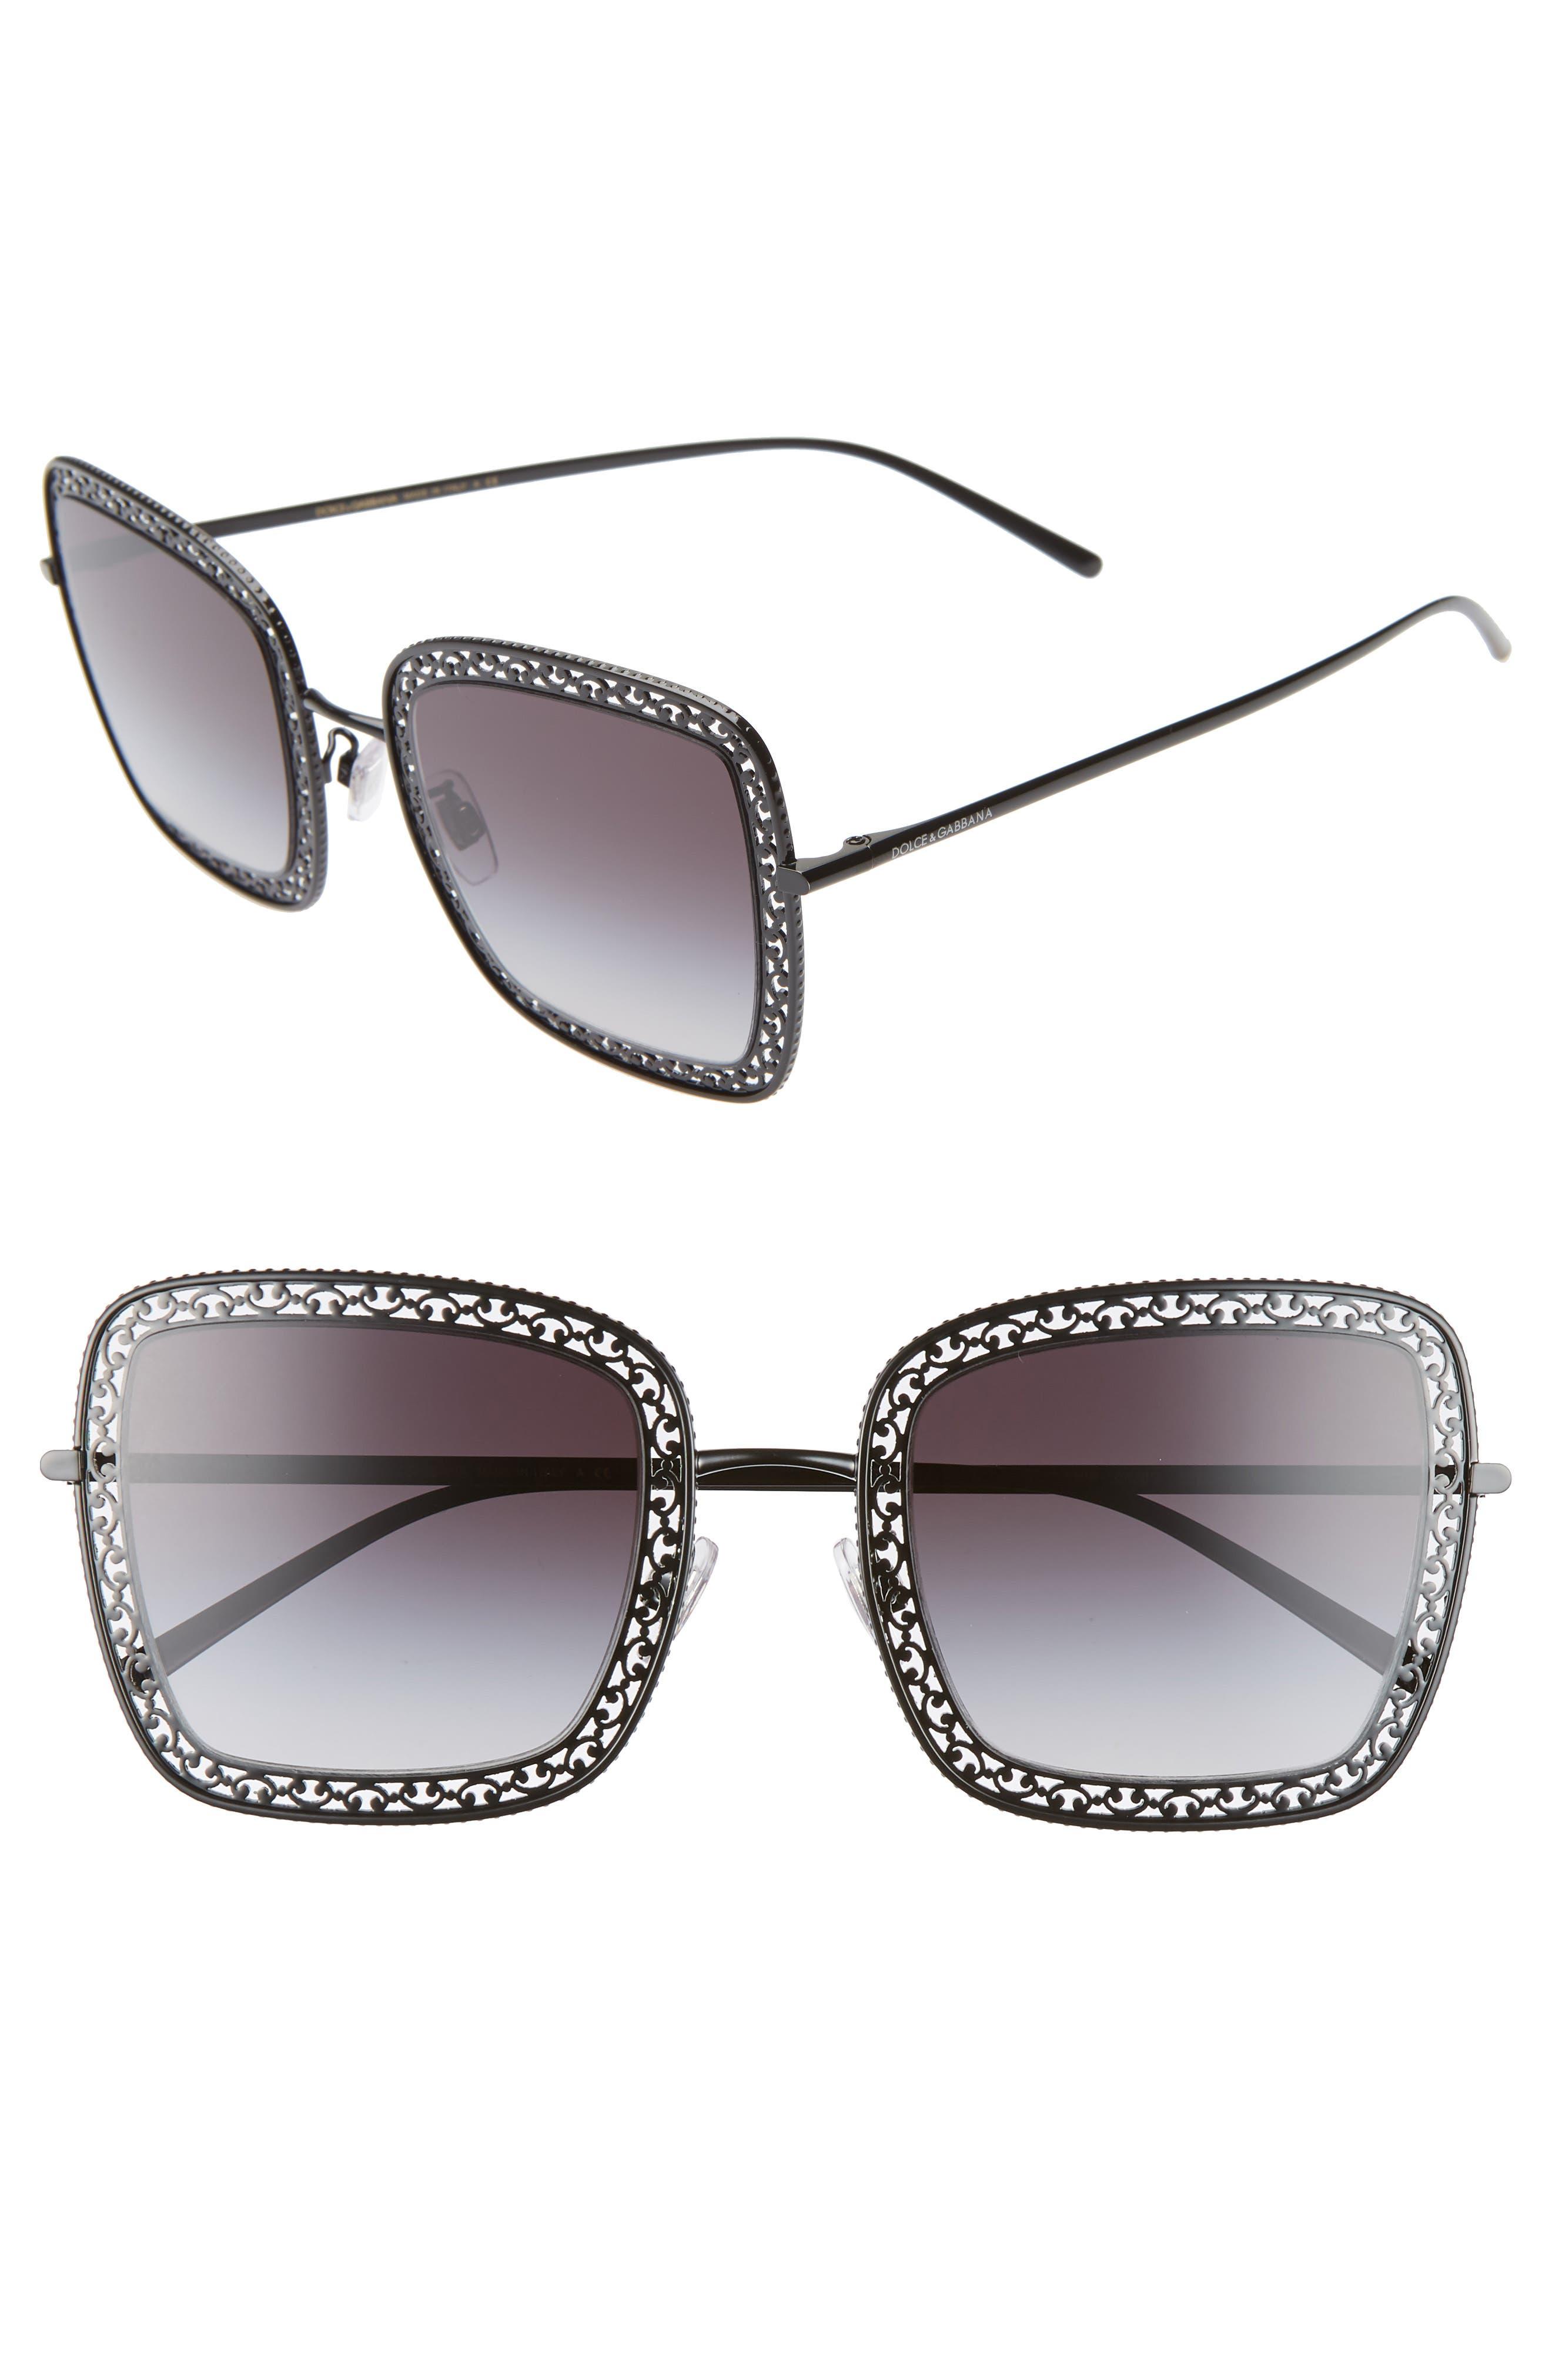 Dolce & gabbana 52Mm Square Sunglasses - Black